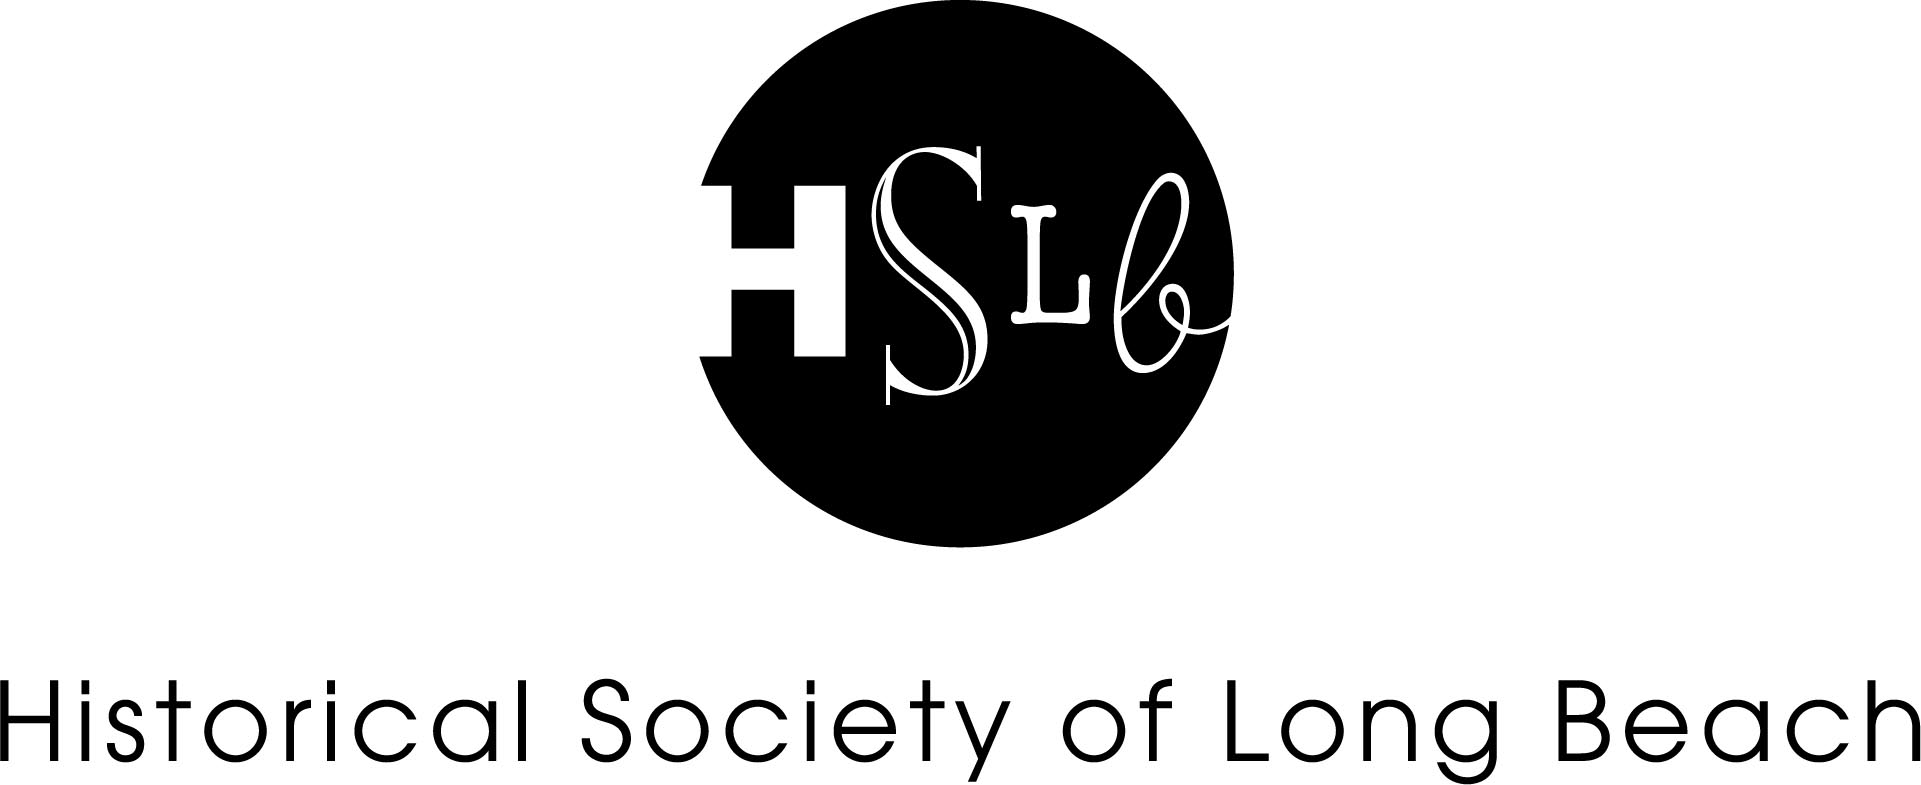 Historical society of long beach logo black and white